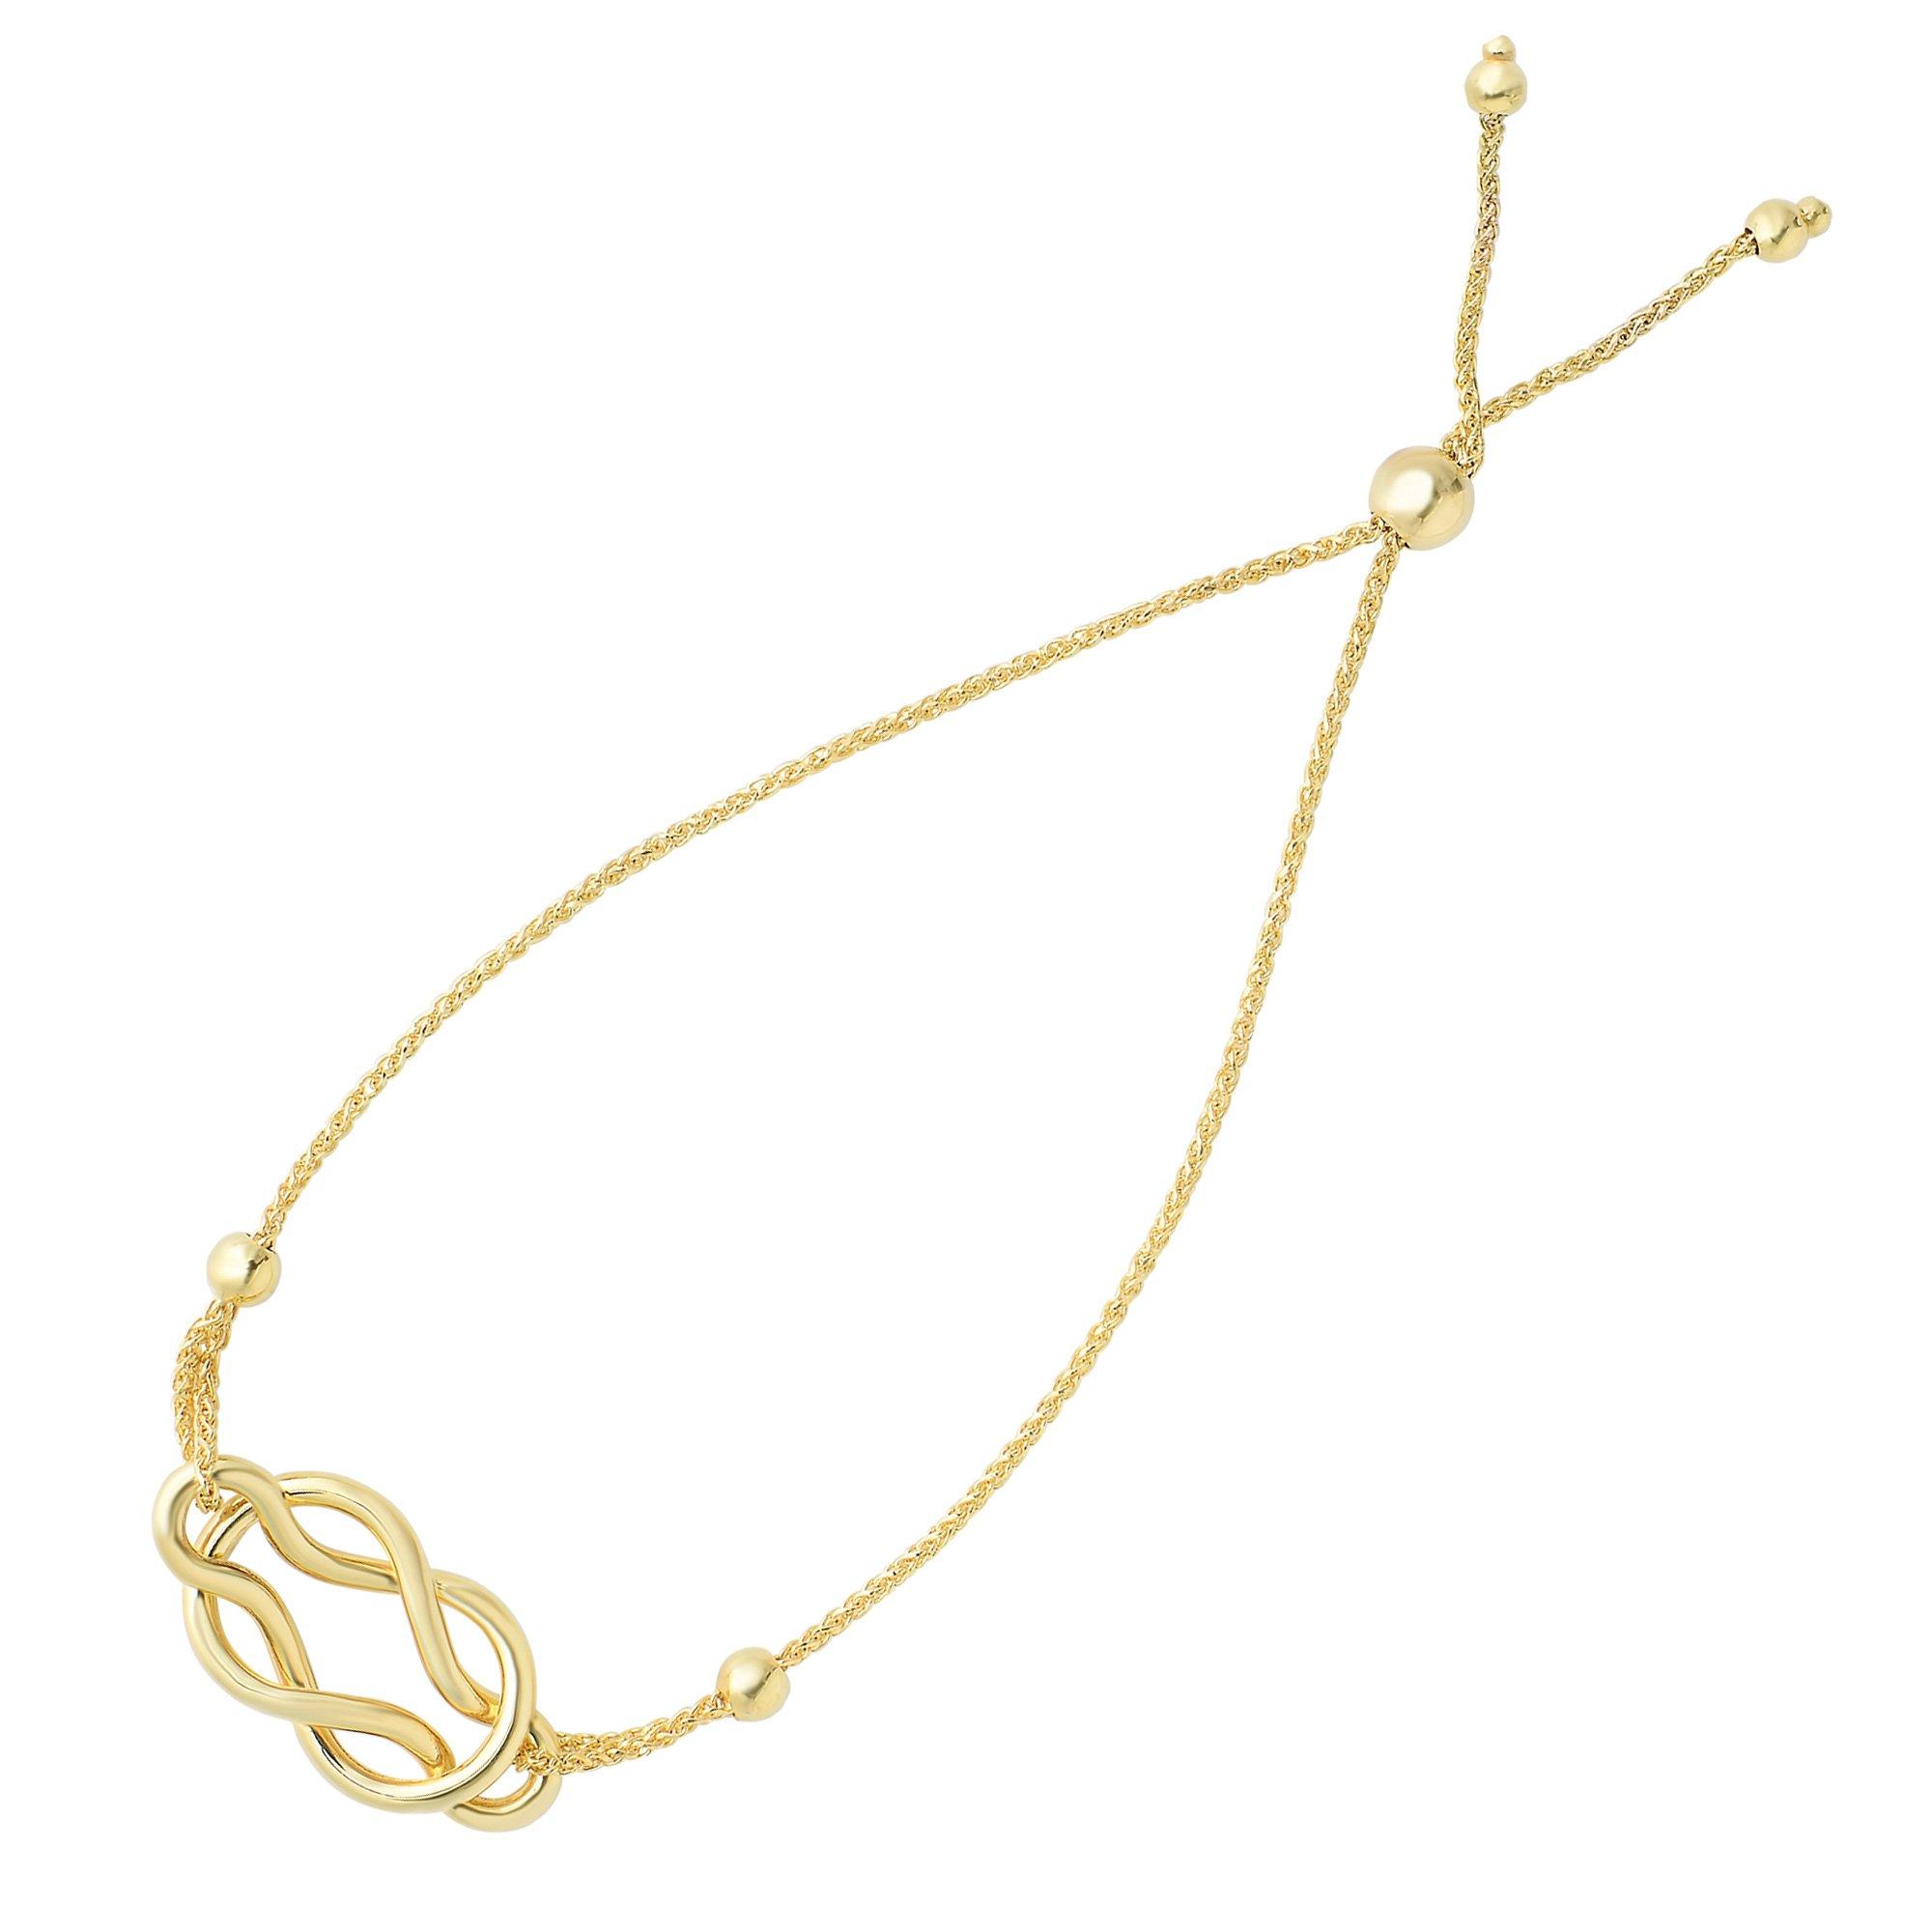 Celtic Knot Center Element Bolo Friendship Adjustable Bracelet In 14K Yellow Gold, 9.25''